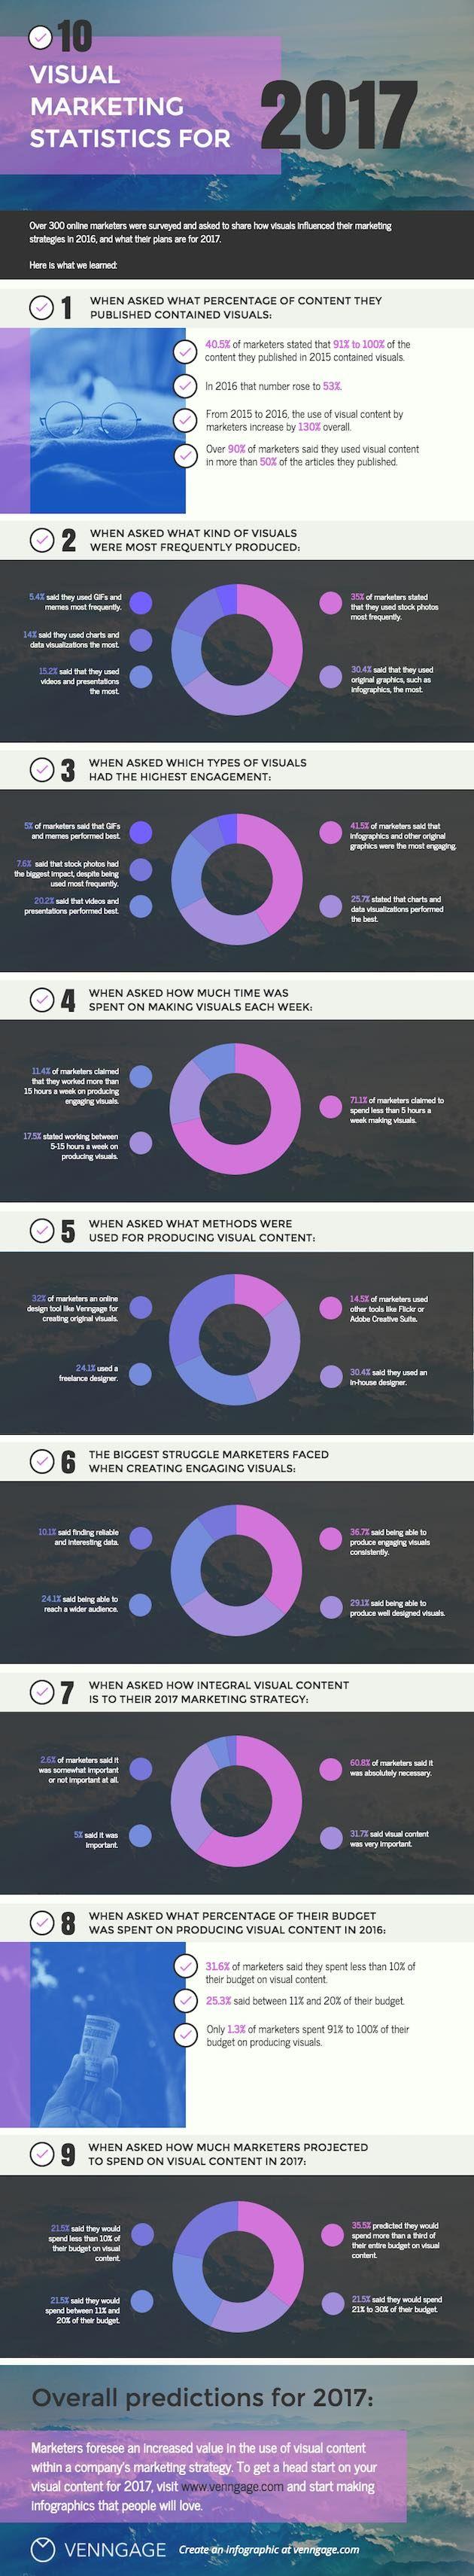 10 Visual Marketing Statistics for 2017 #Infographic